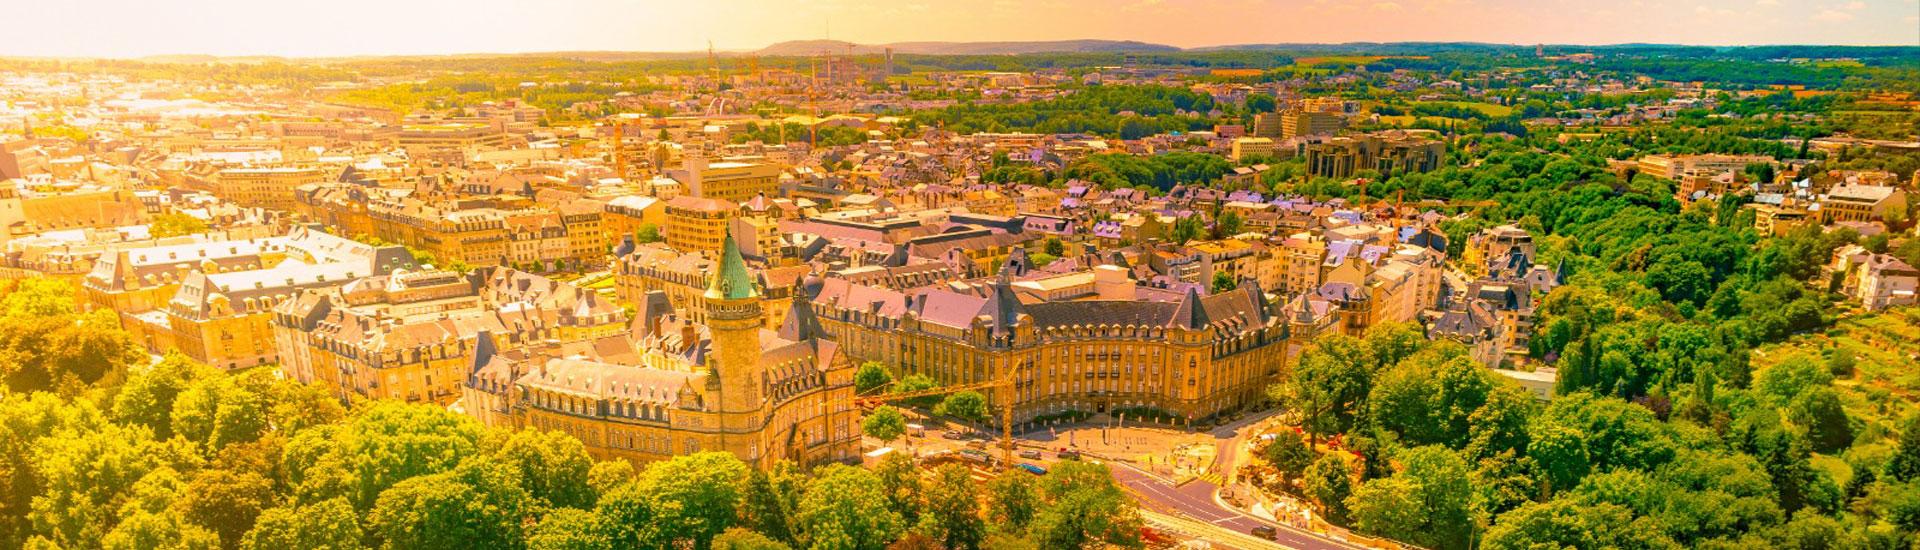 Spedition-Luxemburg-Logistikunternehmen